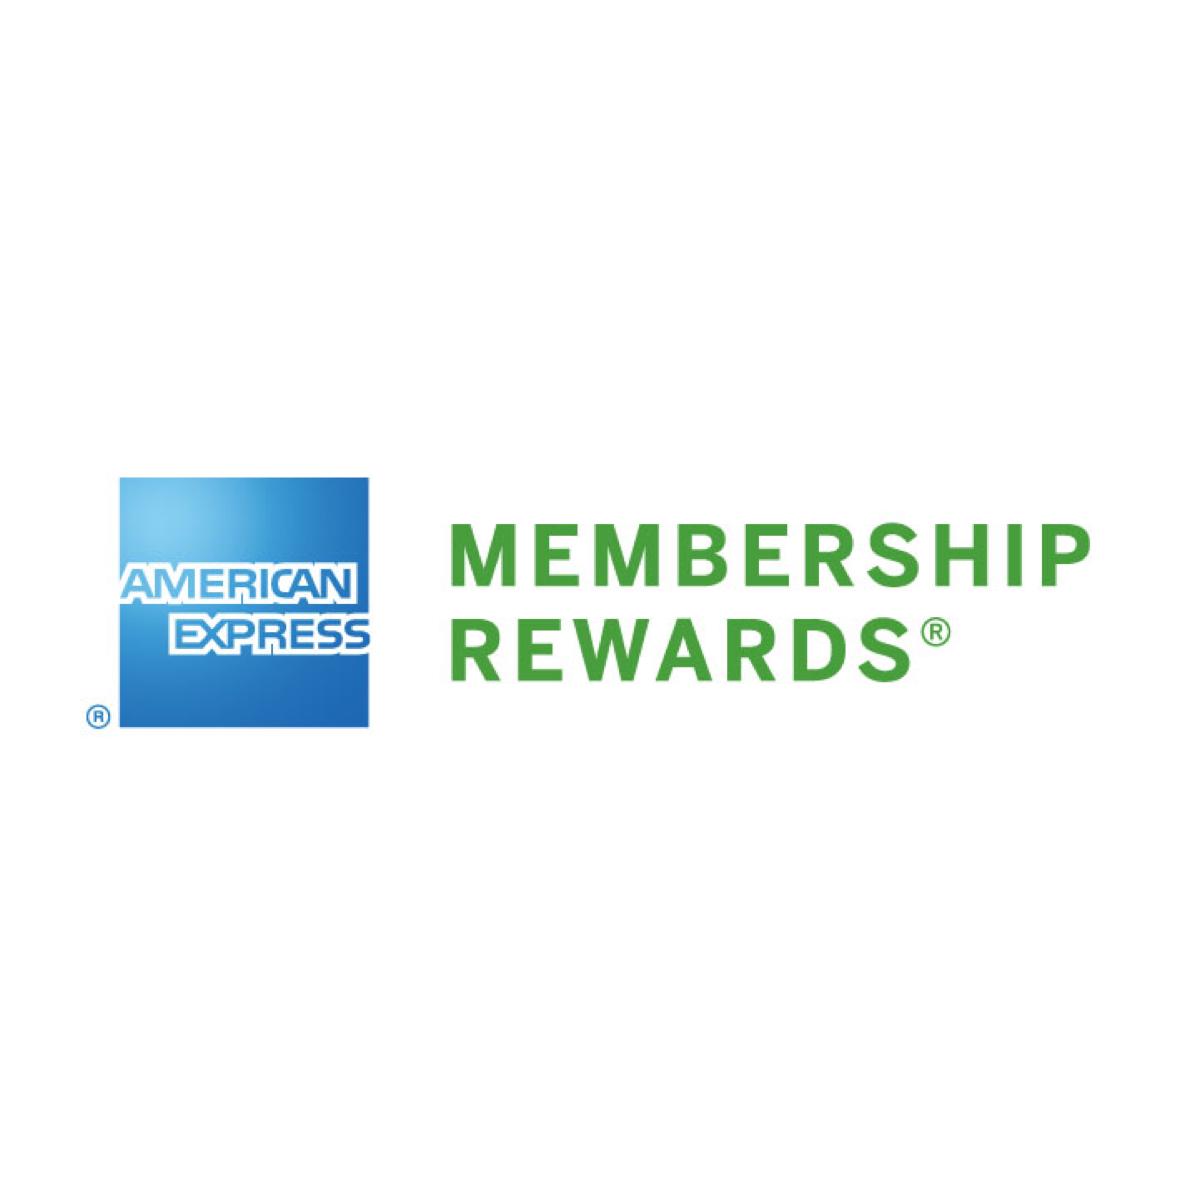 Amex Points Calculators Earning Redeeming Transferring American Express Rewards Membership Rewards Bank Rewards